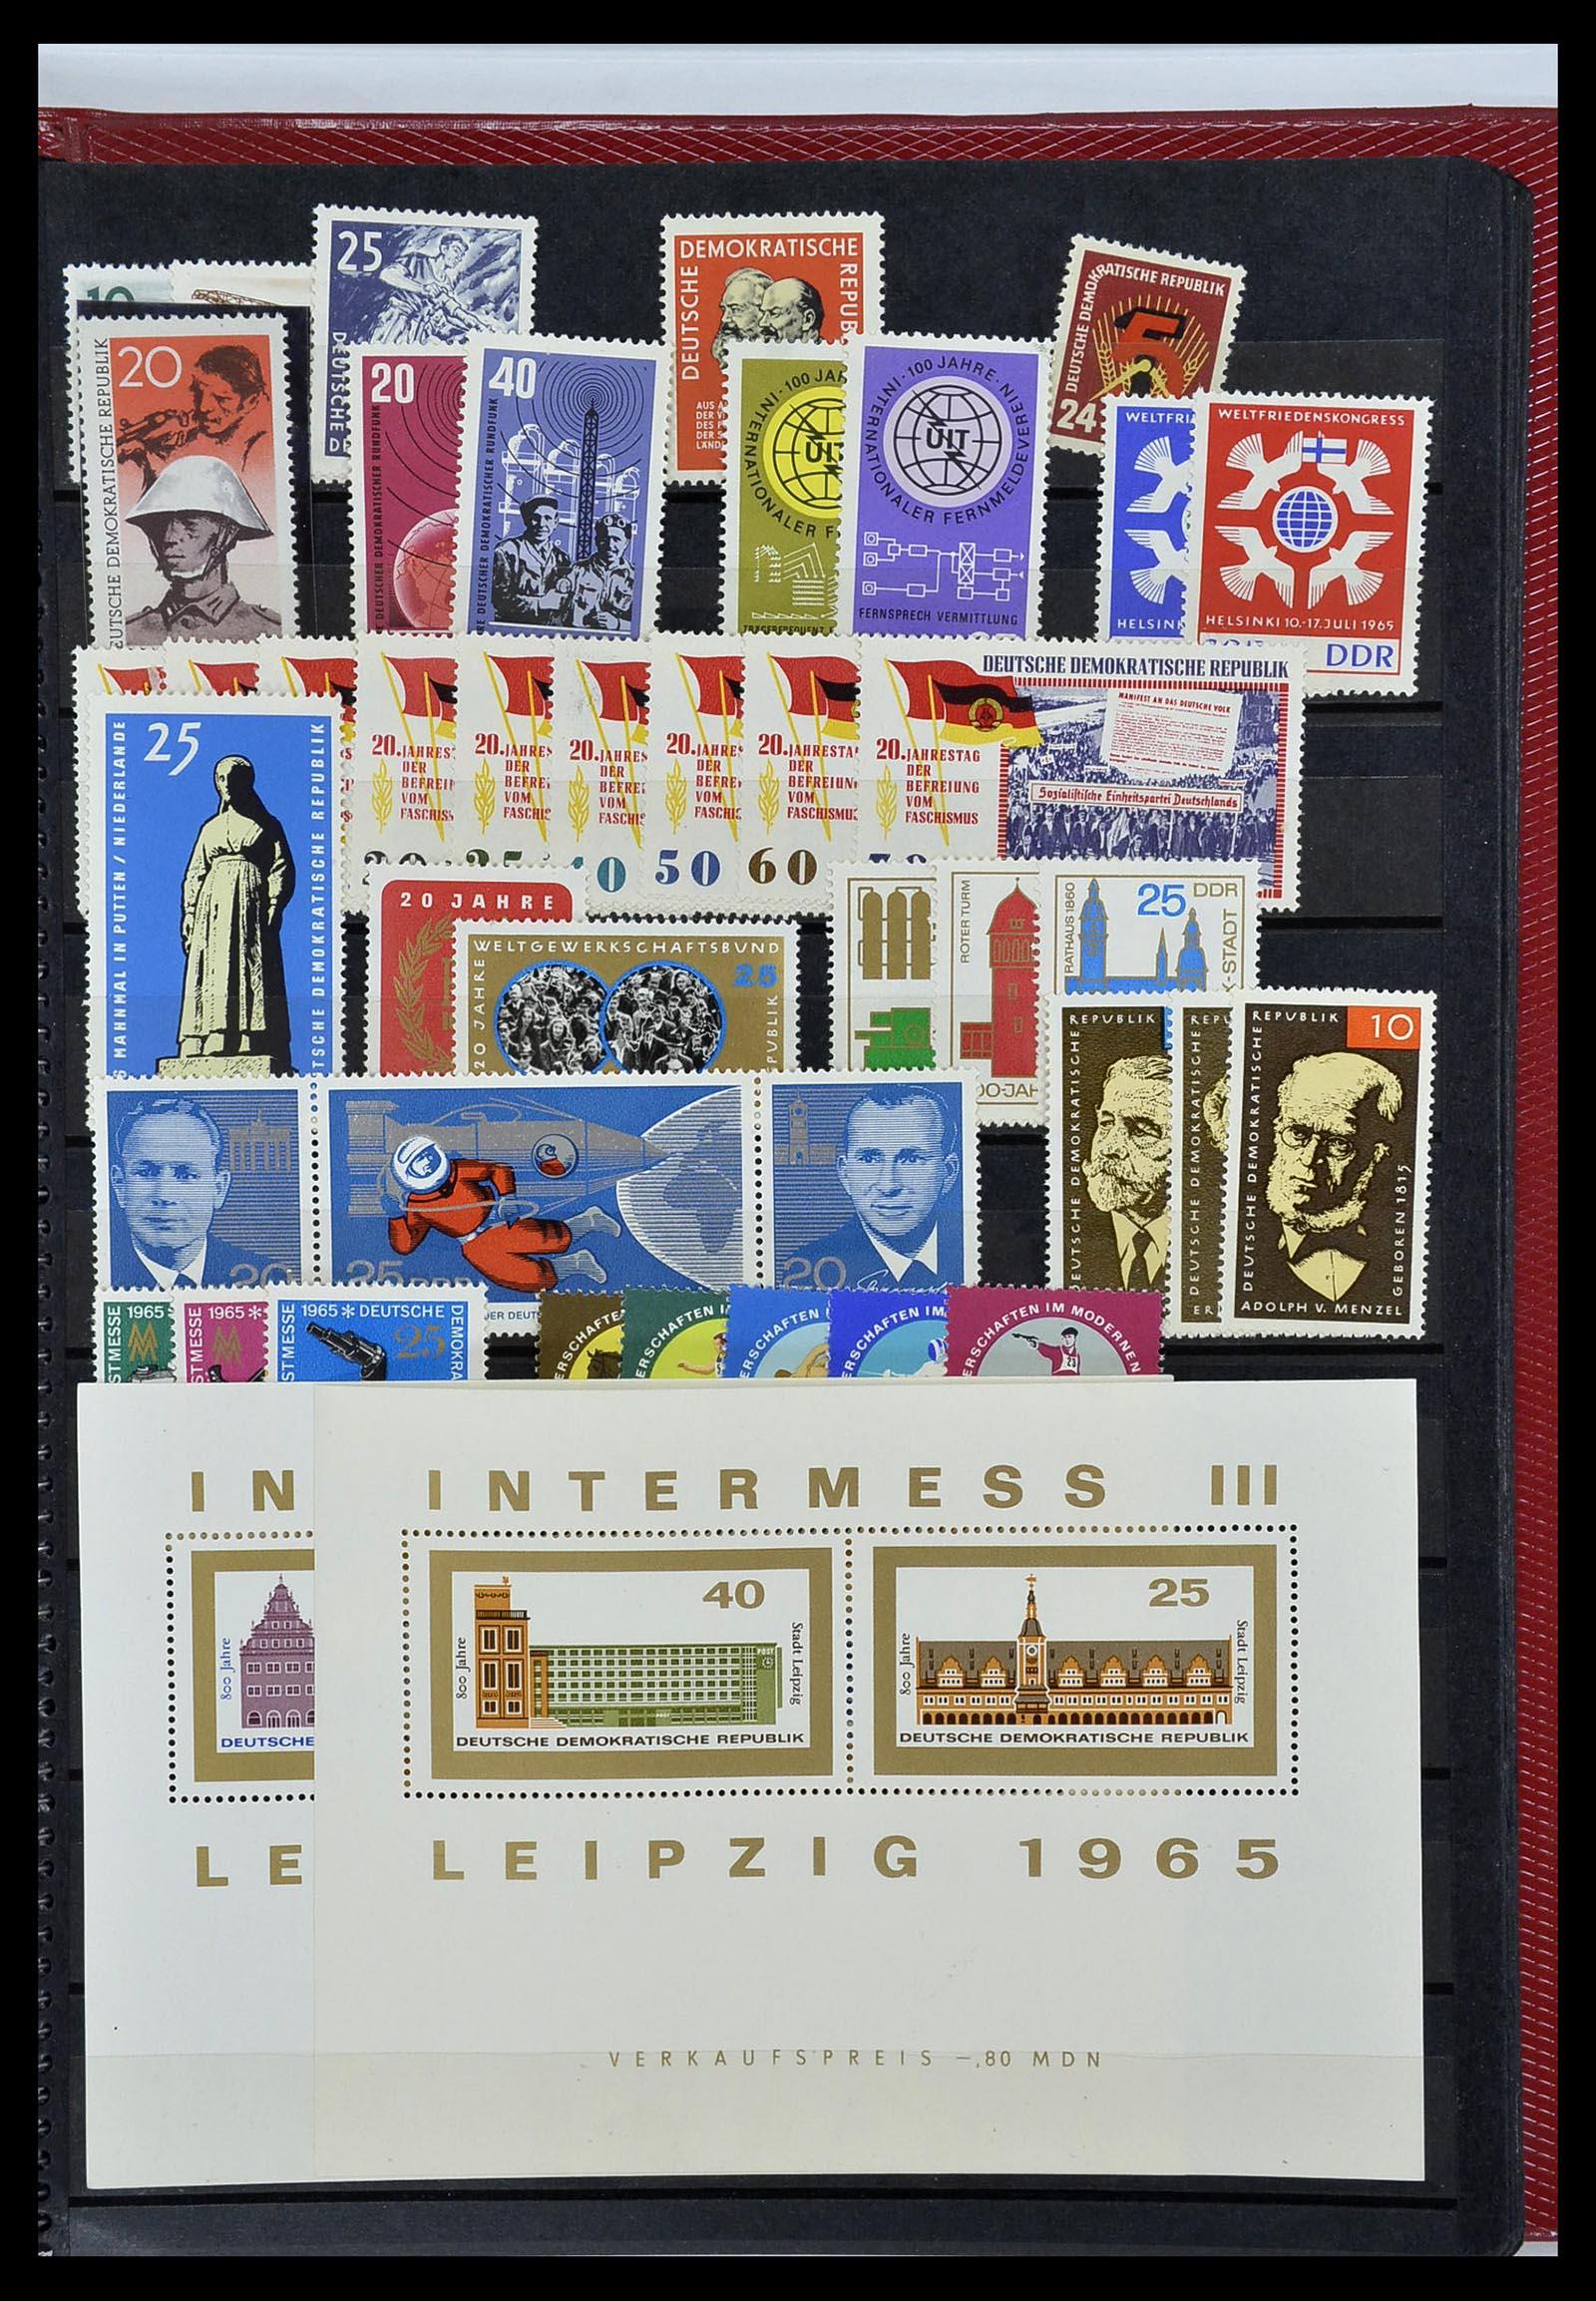 34169 003 - Postzegelverzameling 34169 Duitsland 1880-1955.